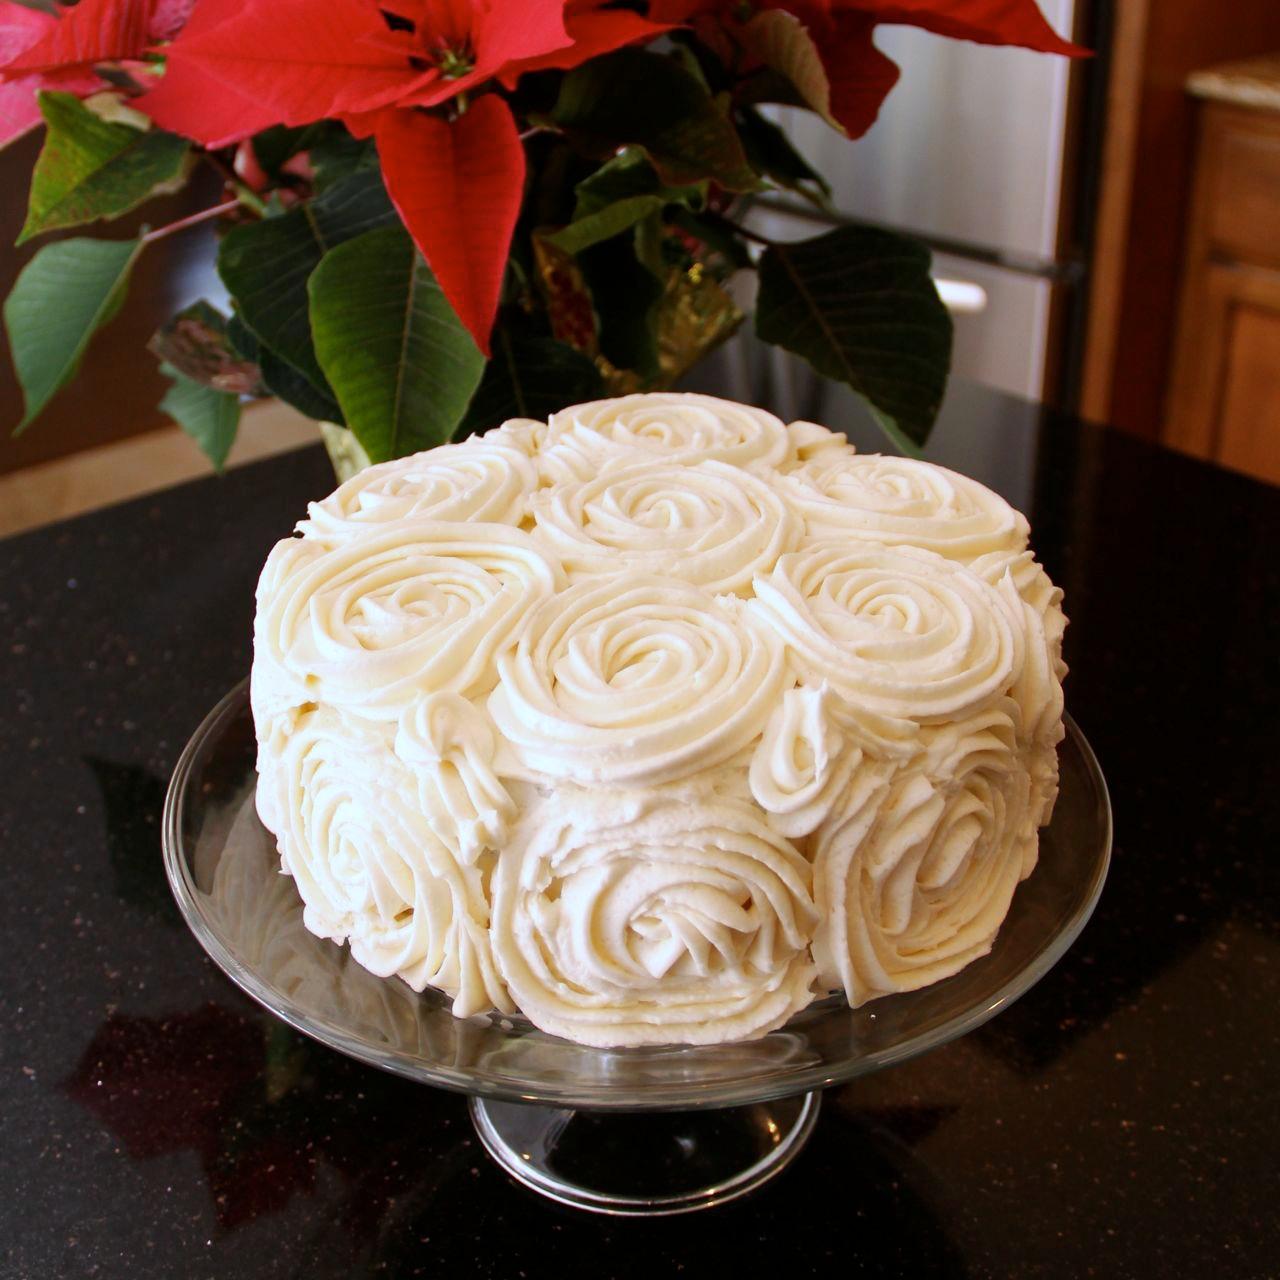 Shower Of Roses: A Christmas Rose Birthday Cake